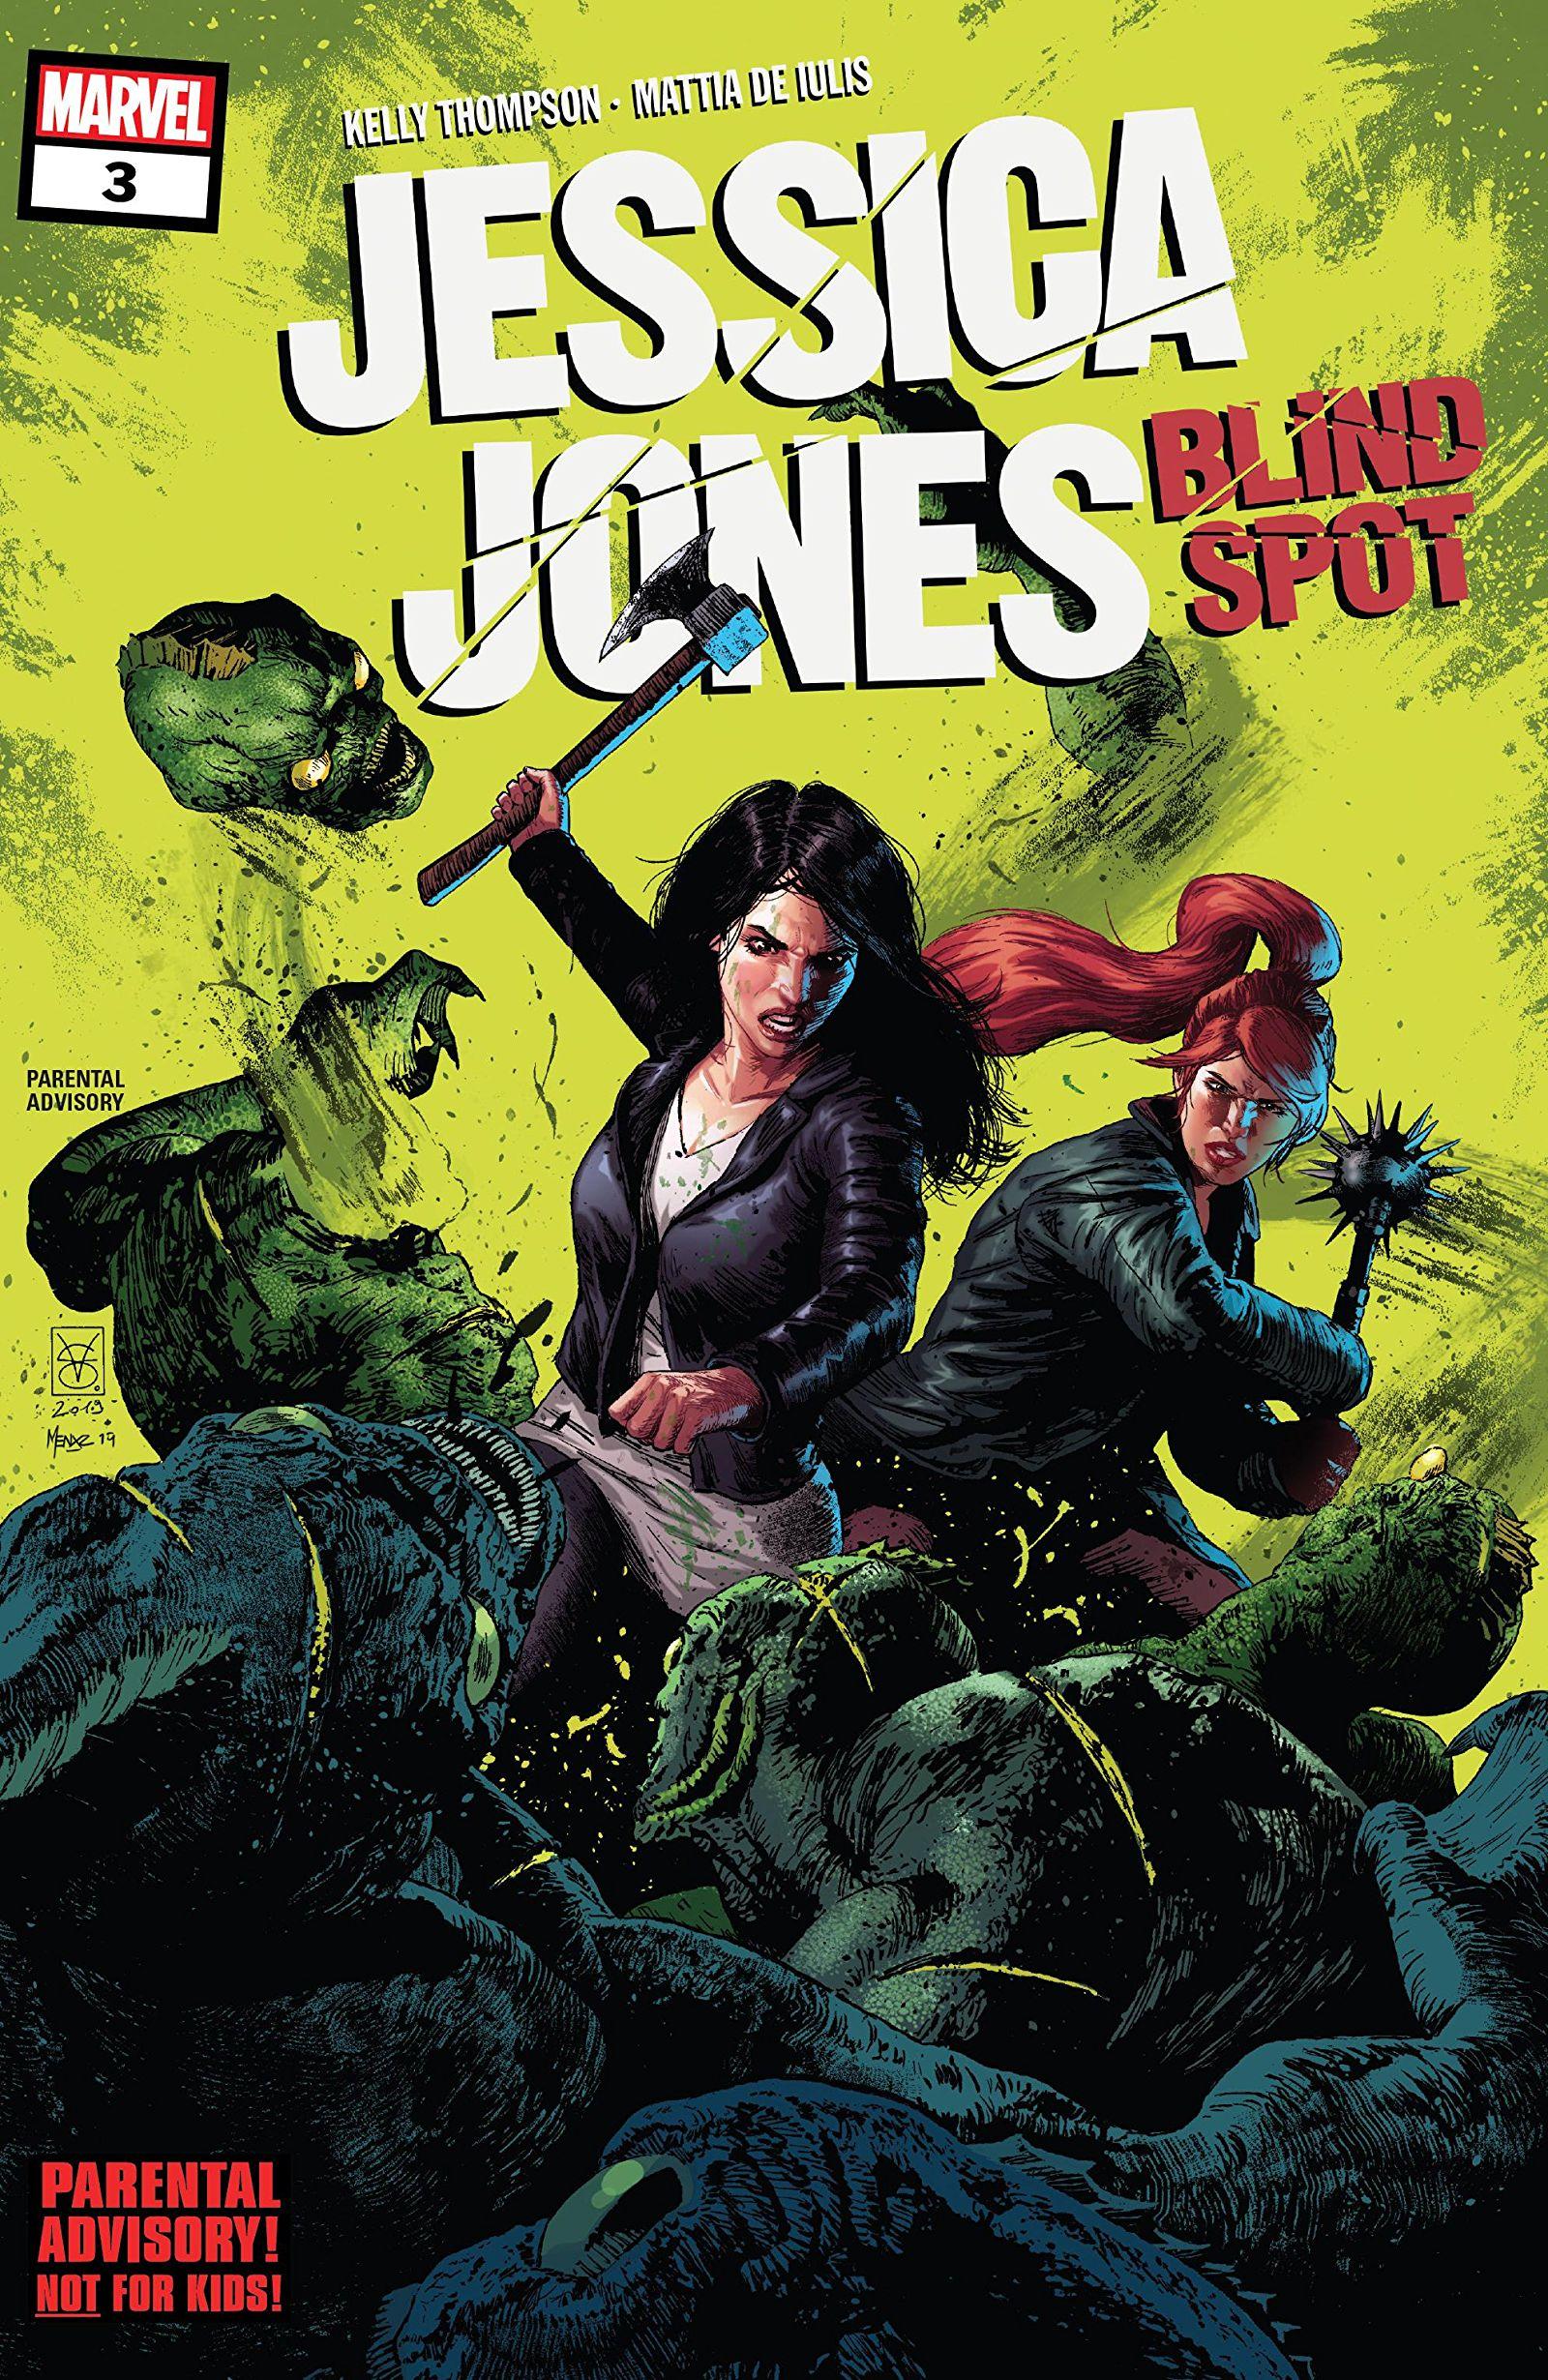 Jessica Jones: Blind Spot Vol 1 3